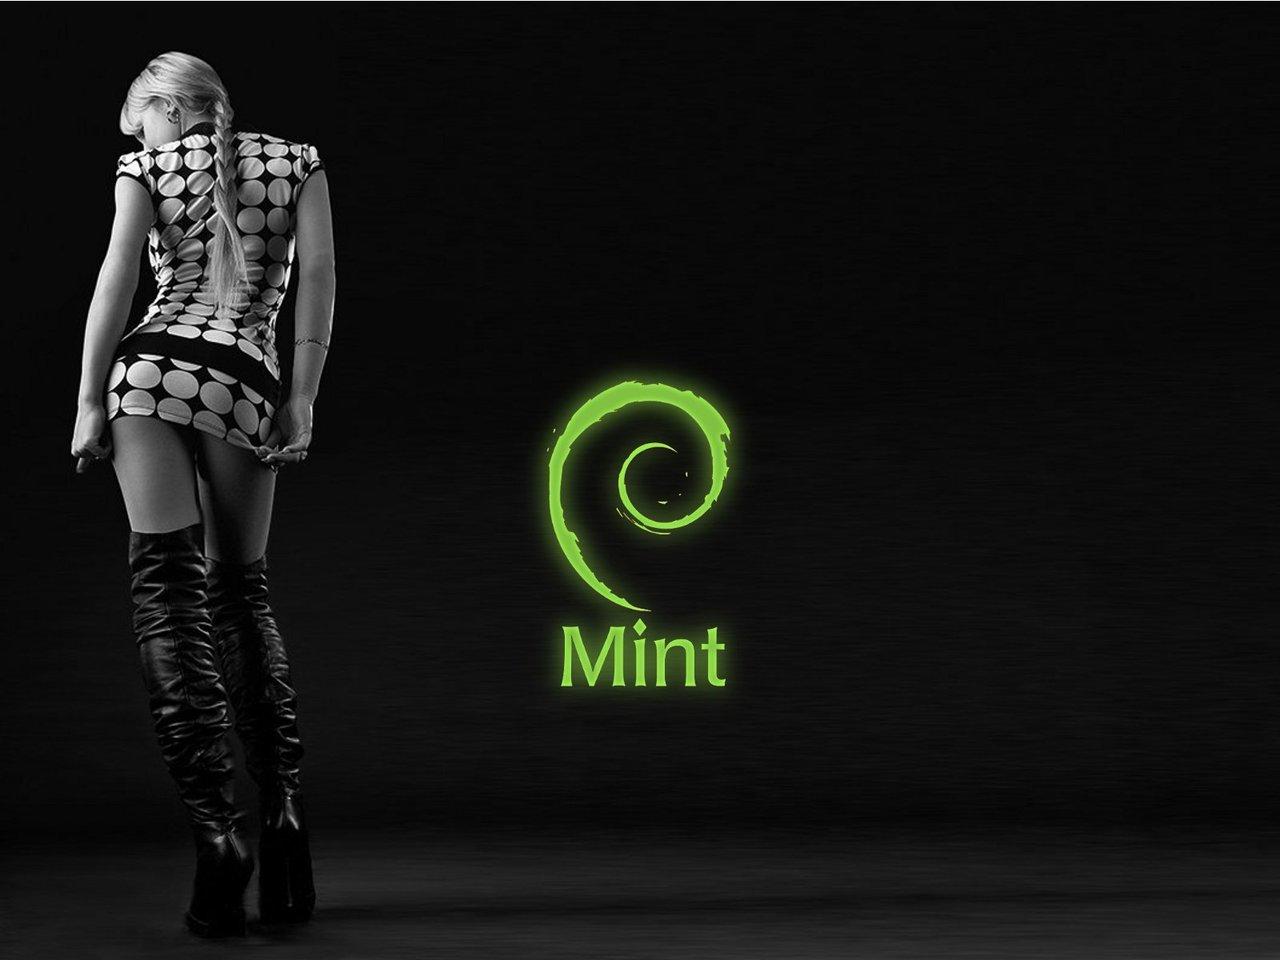 Linux Mint lucyfe My wallpaper Mint Debian 1280x960